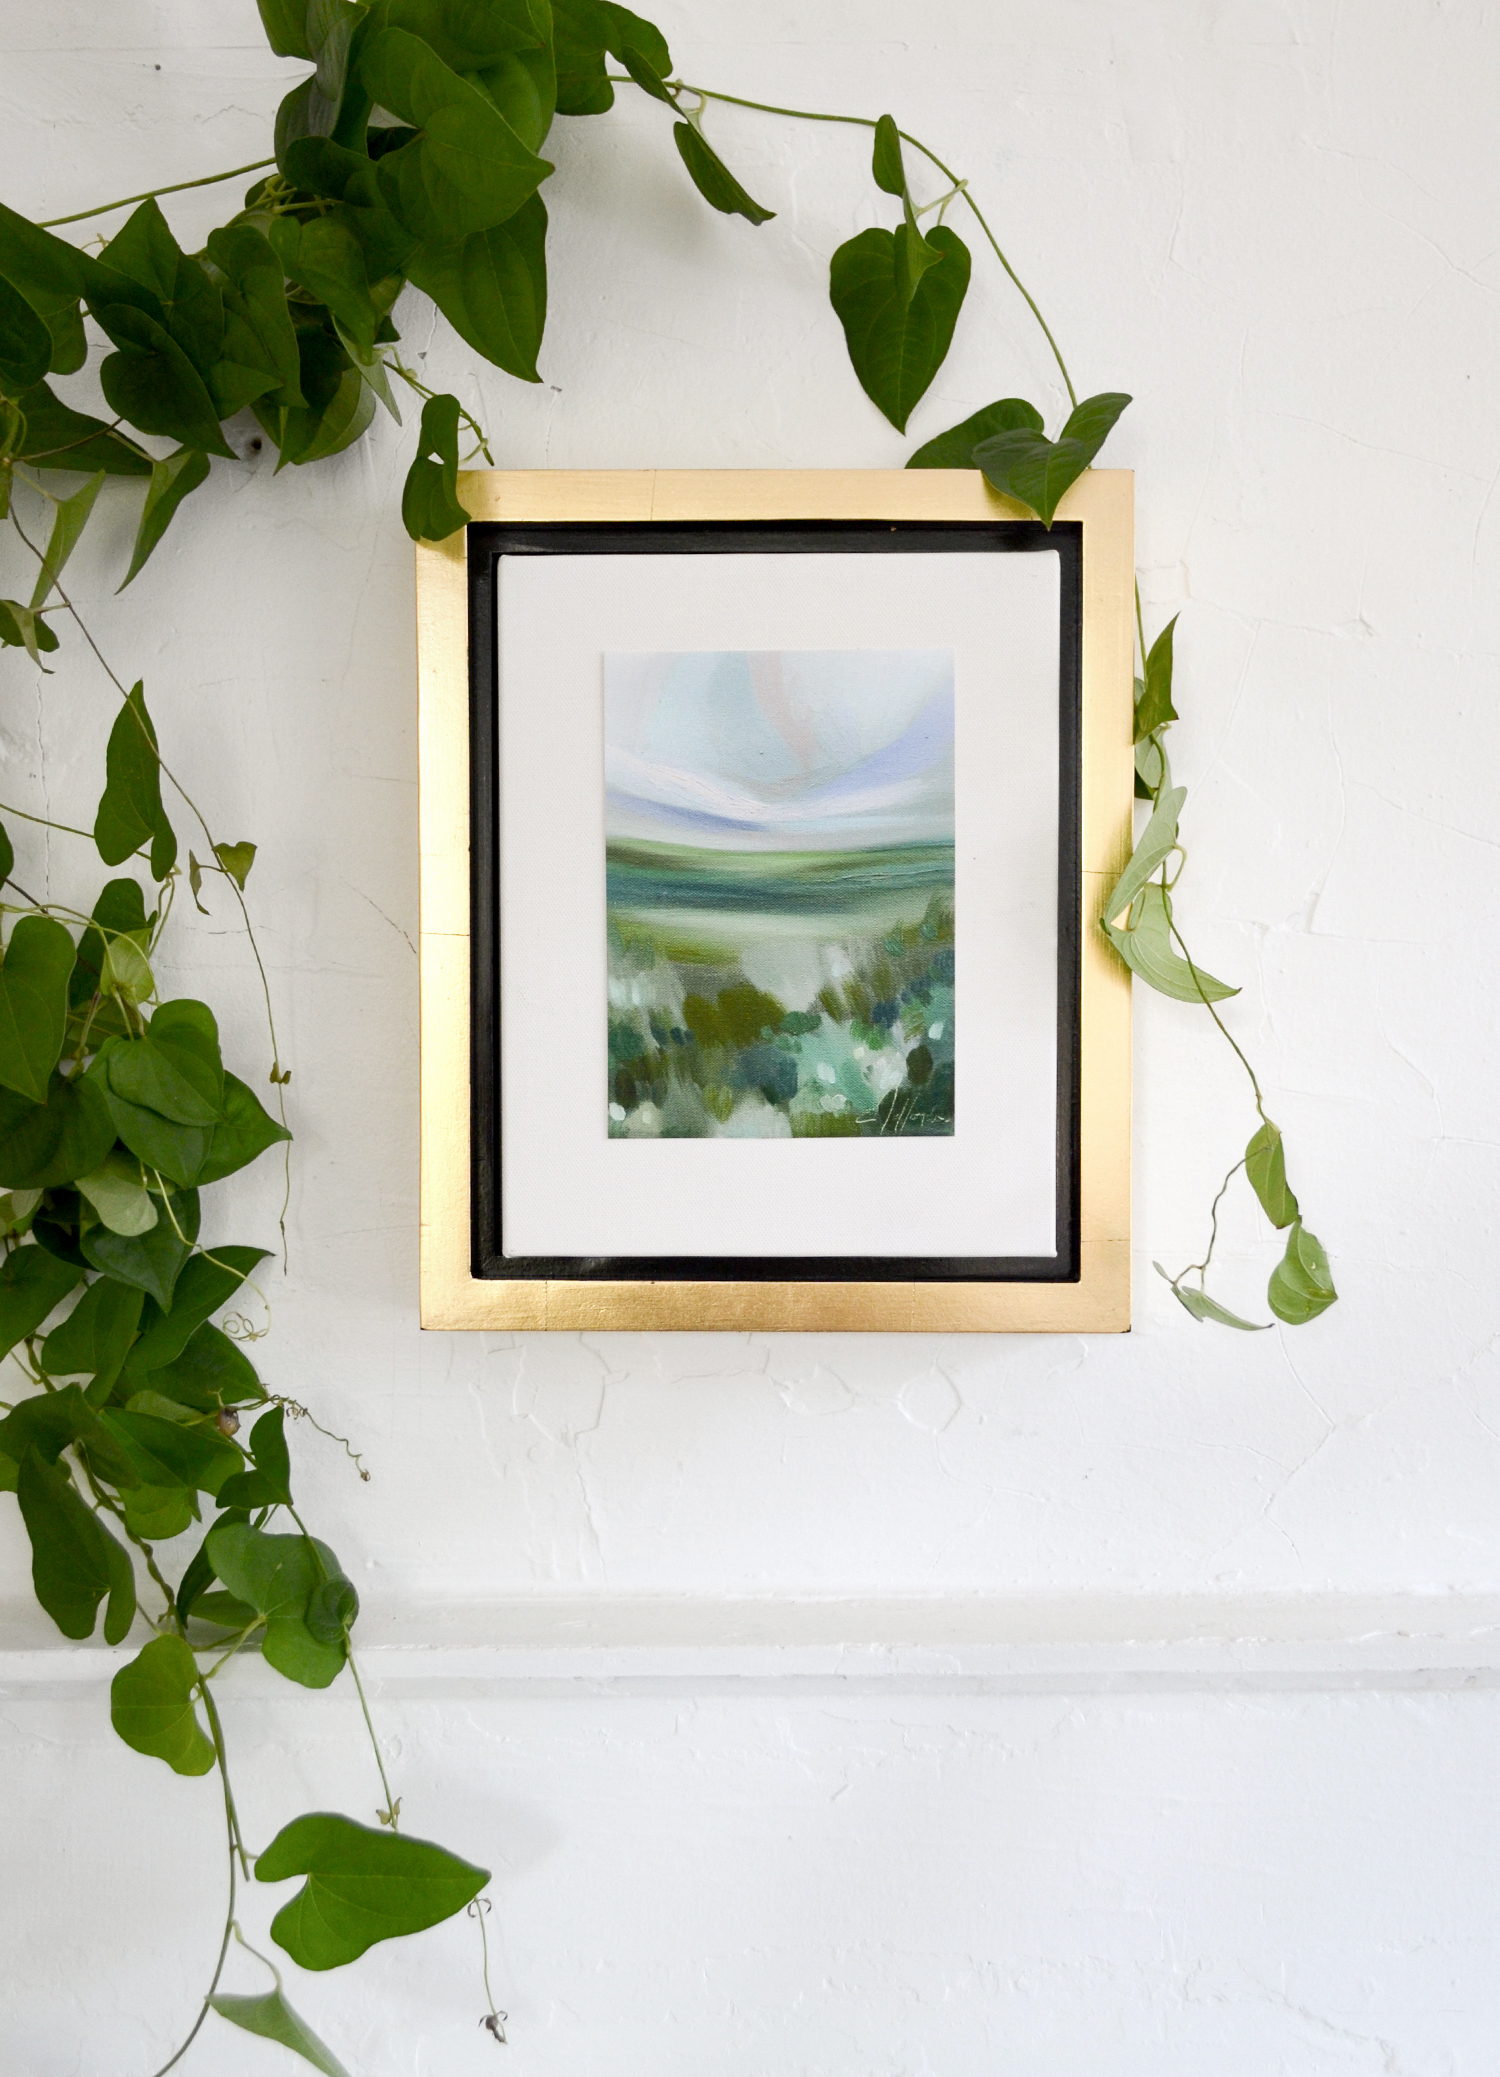 Warming Fields Framed In A Golden Floater Frame 10x12 Emily Jeffords